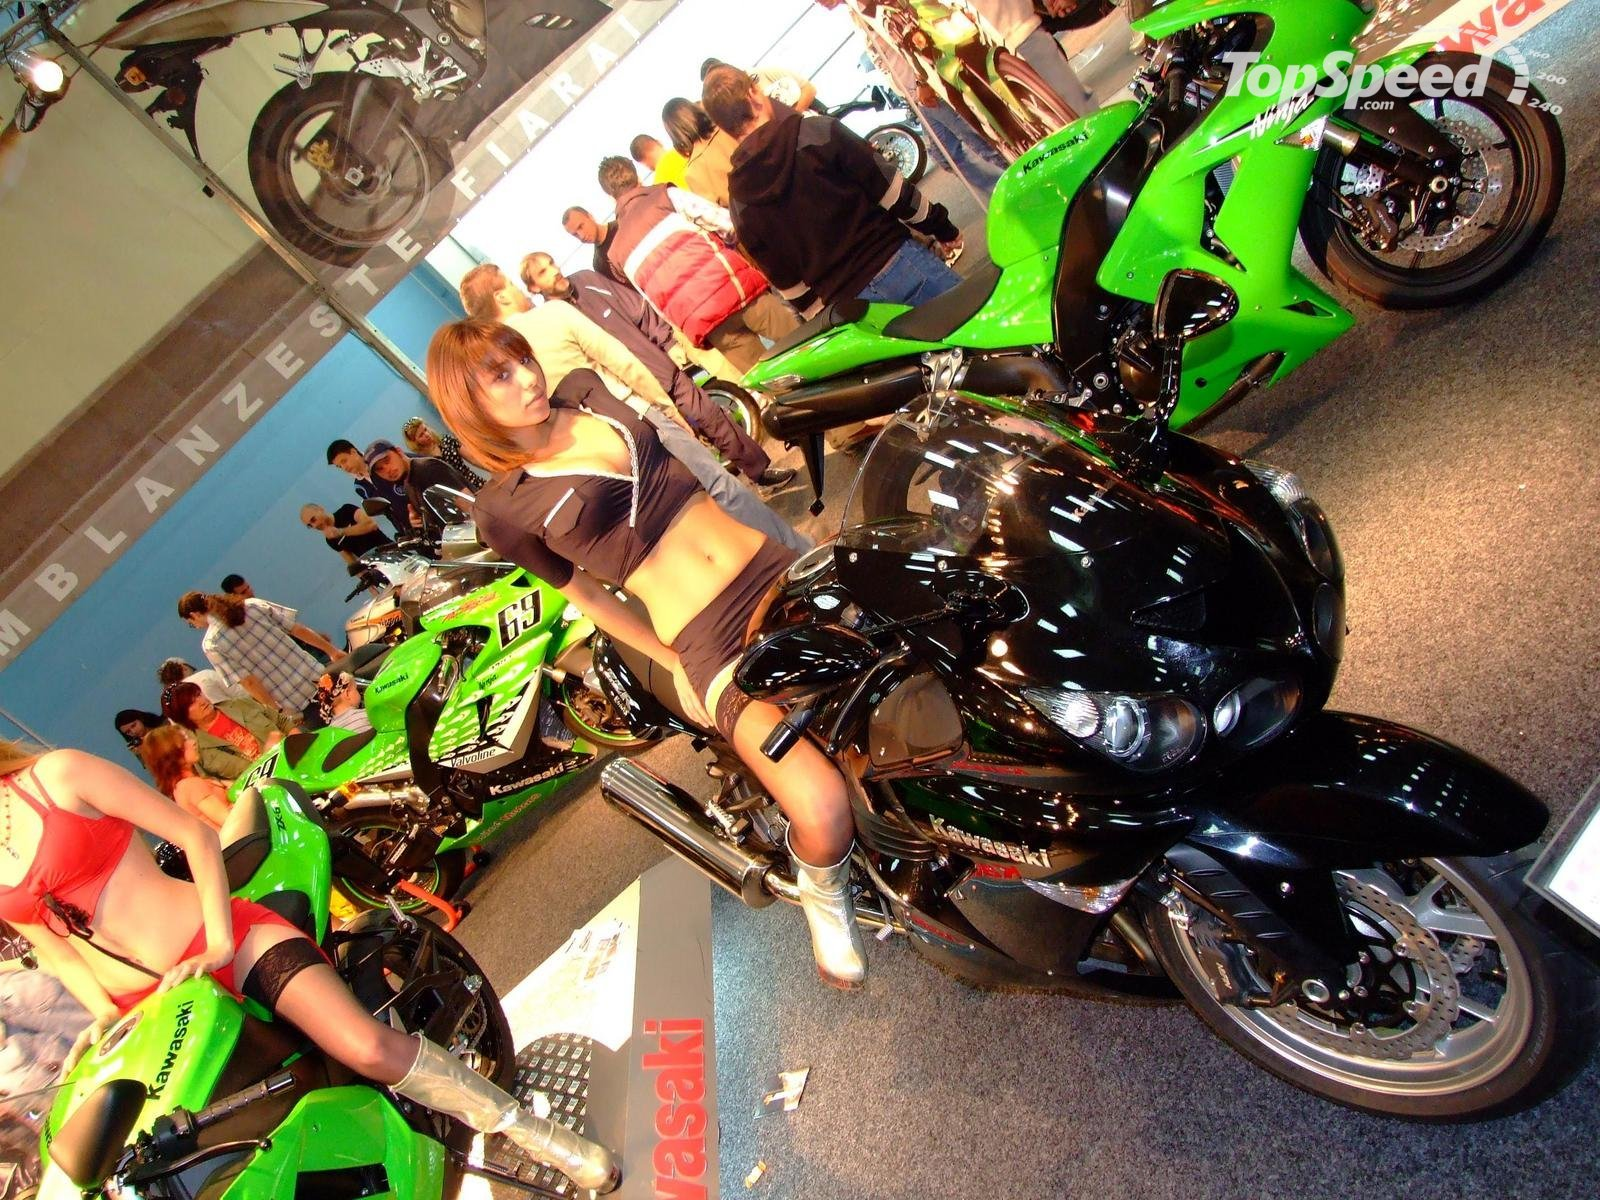 motorcyclesclass=motorcycles